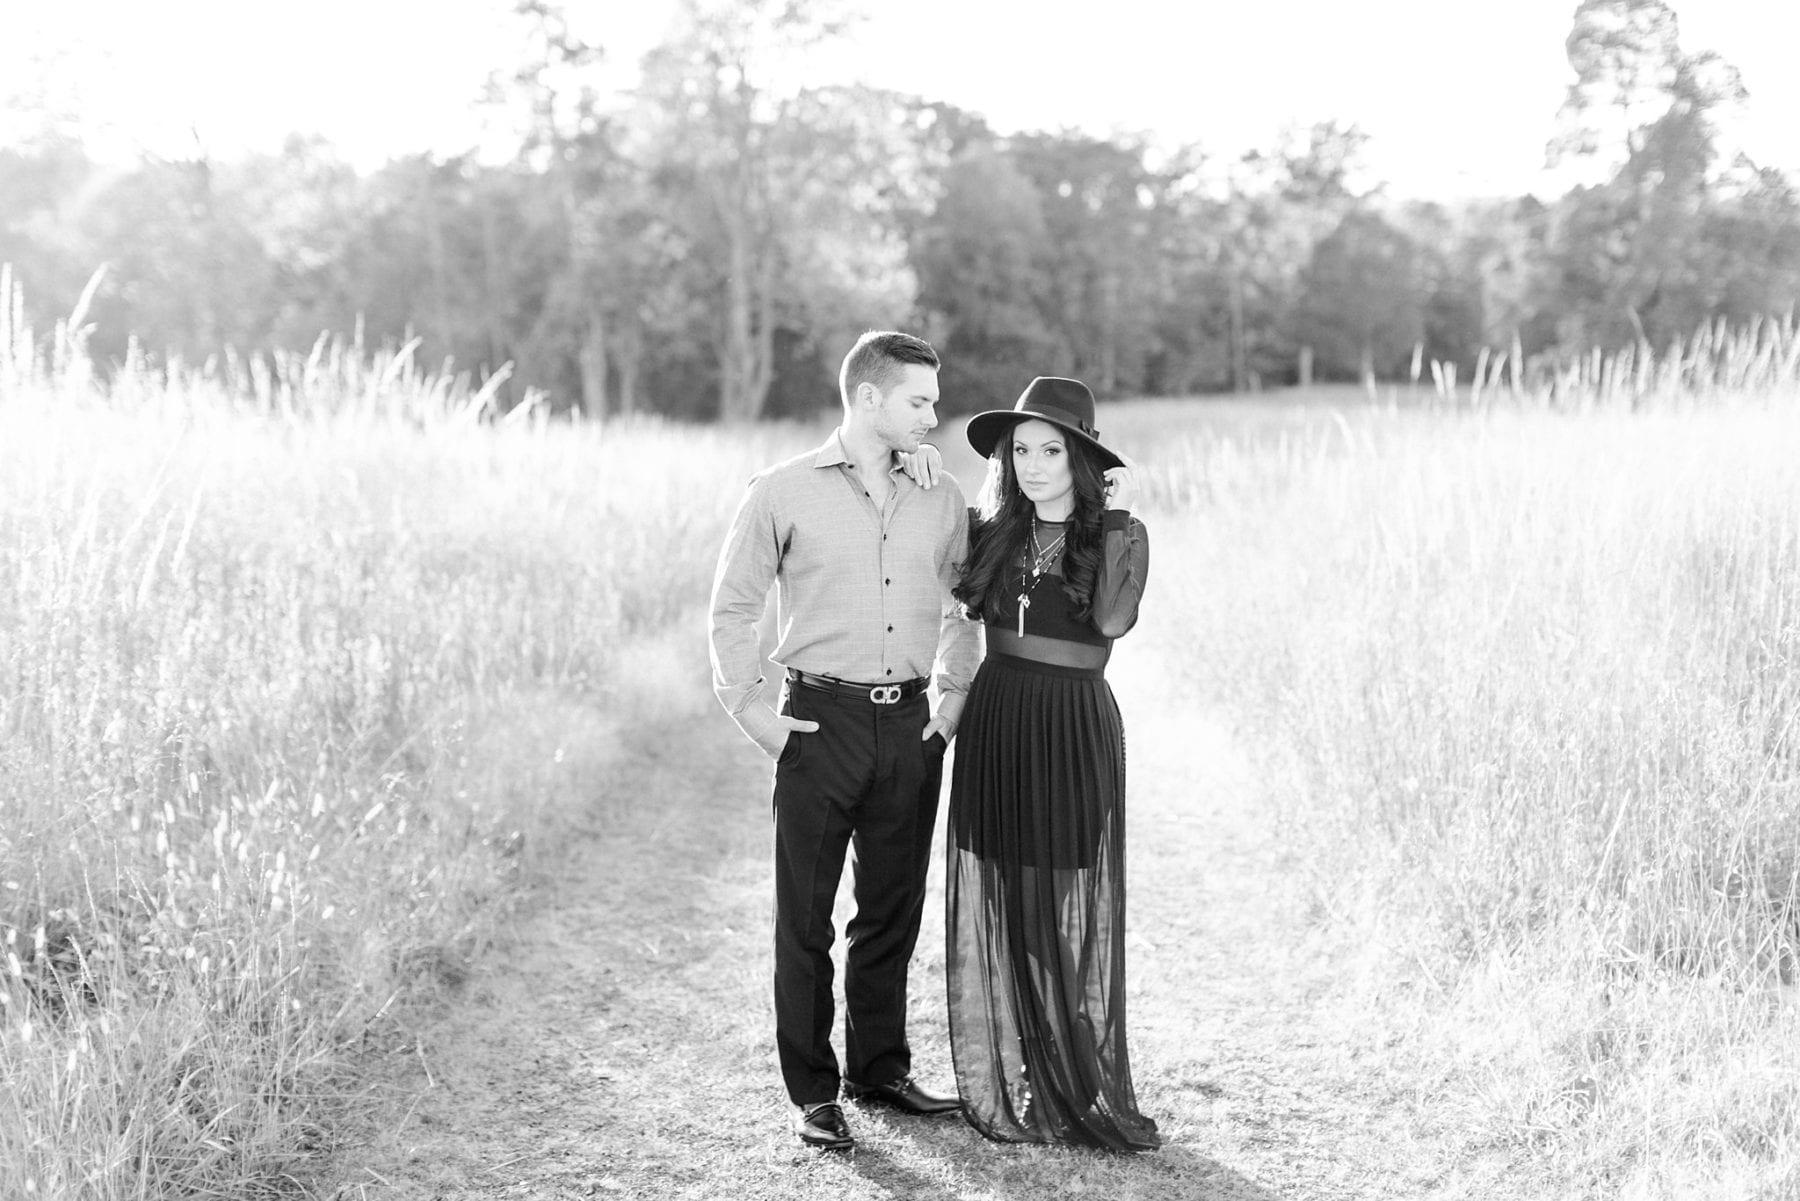 Manassas Battlefield Portraits Virginia Wedding Photographer Megan Kelsey Photography Lianne & Chris-167.jpg